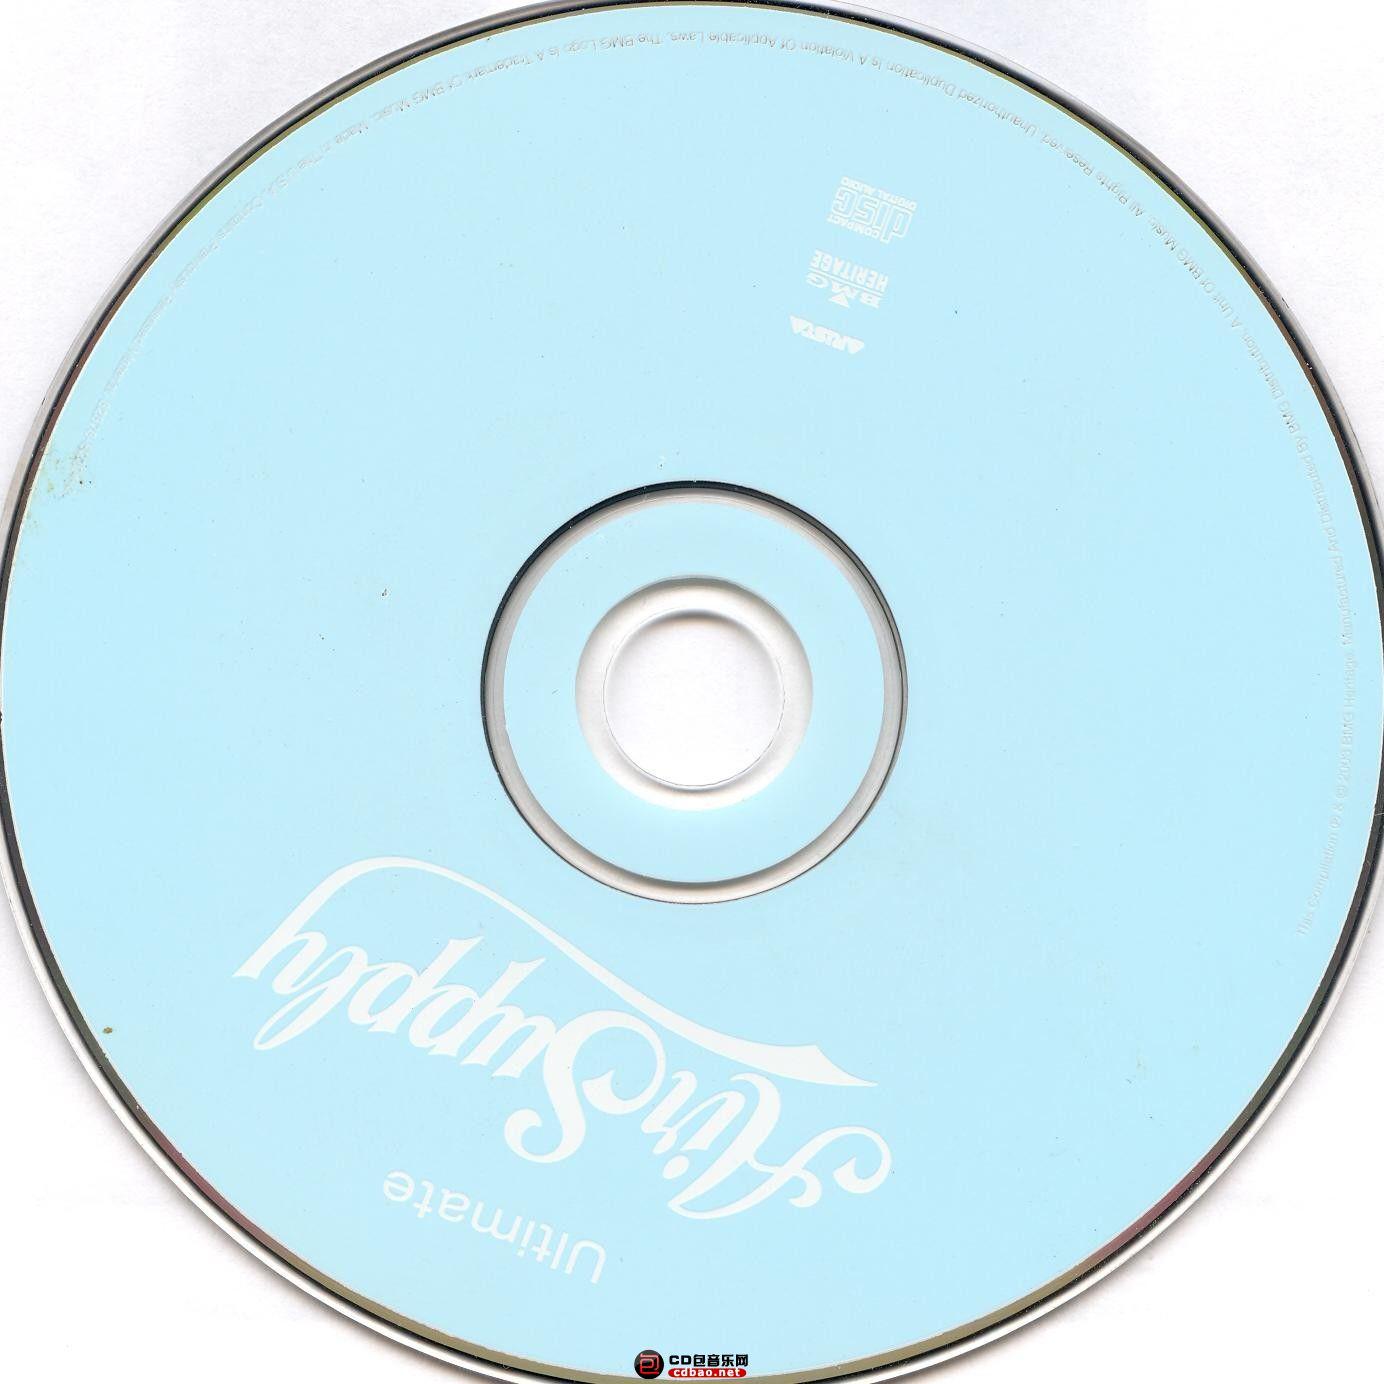 AirSupply - Ultimate Air Supply - CD.jpg